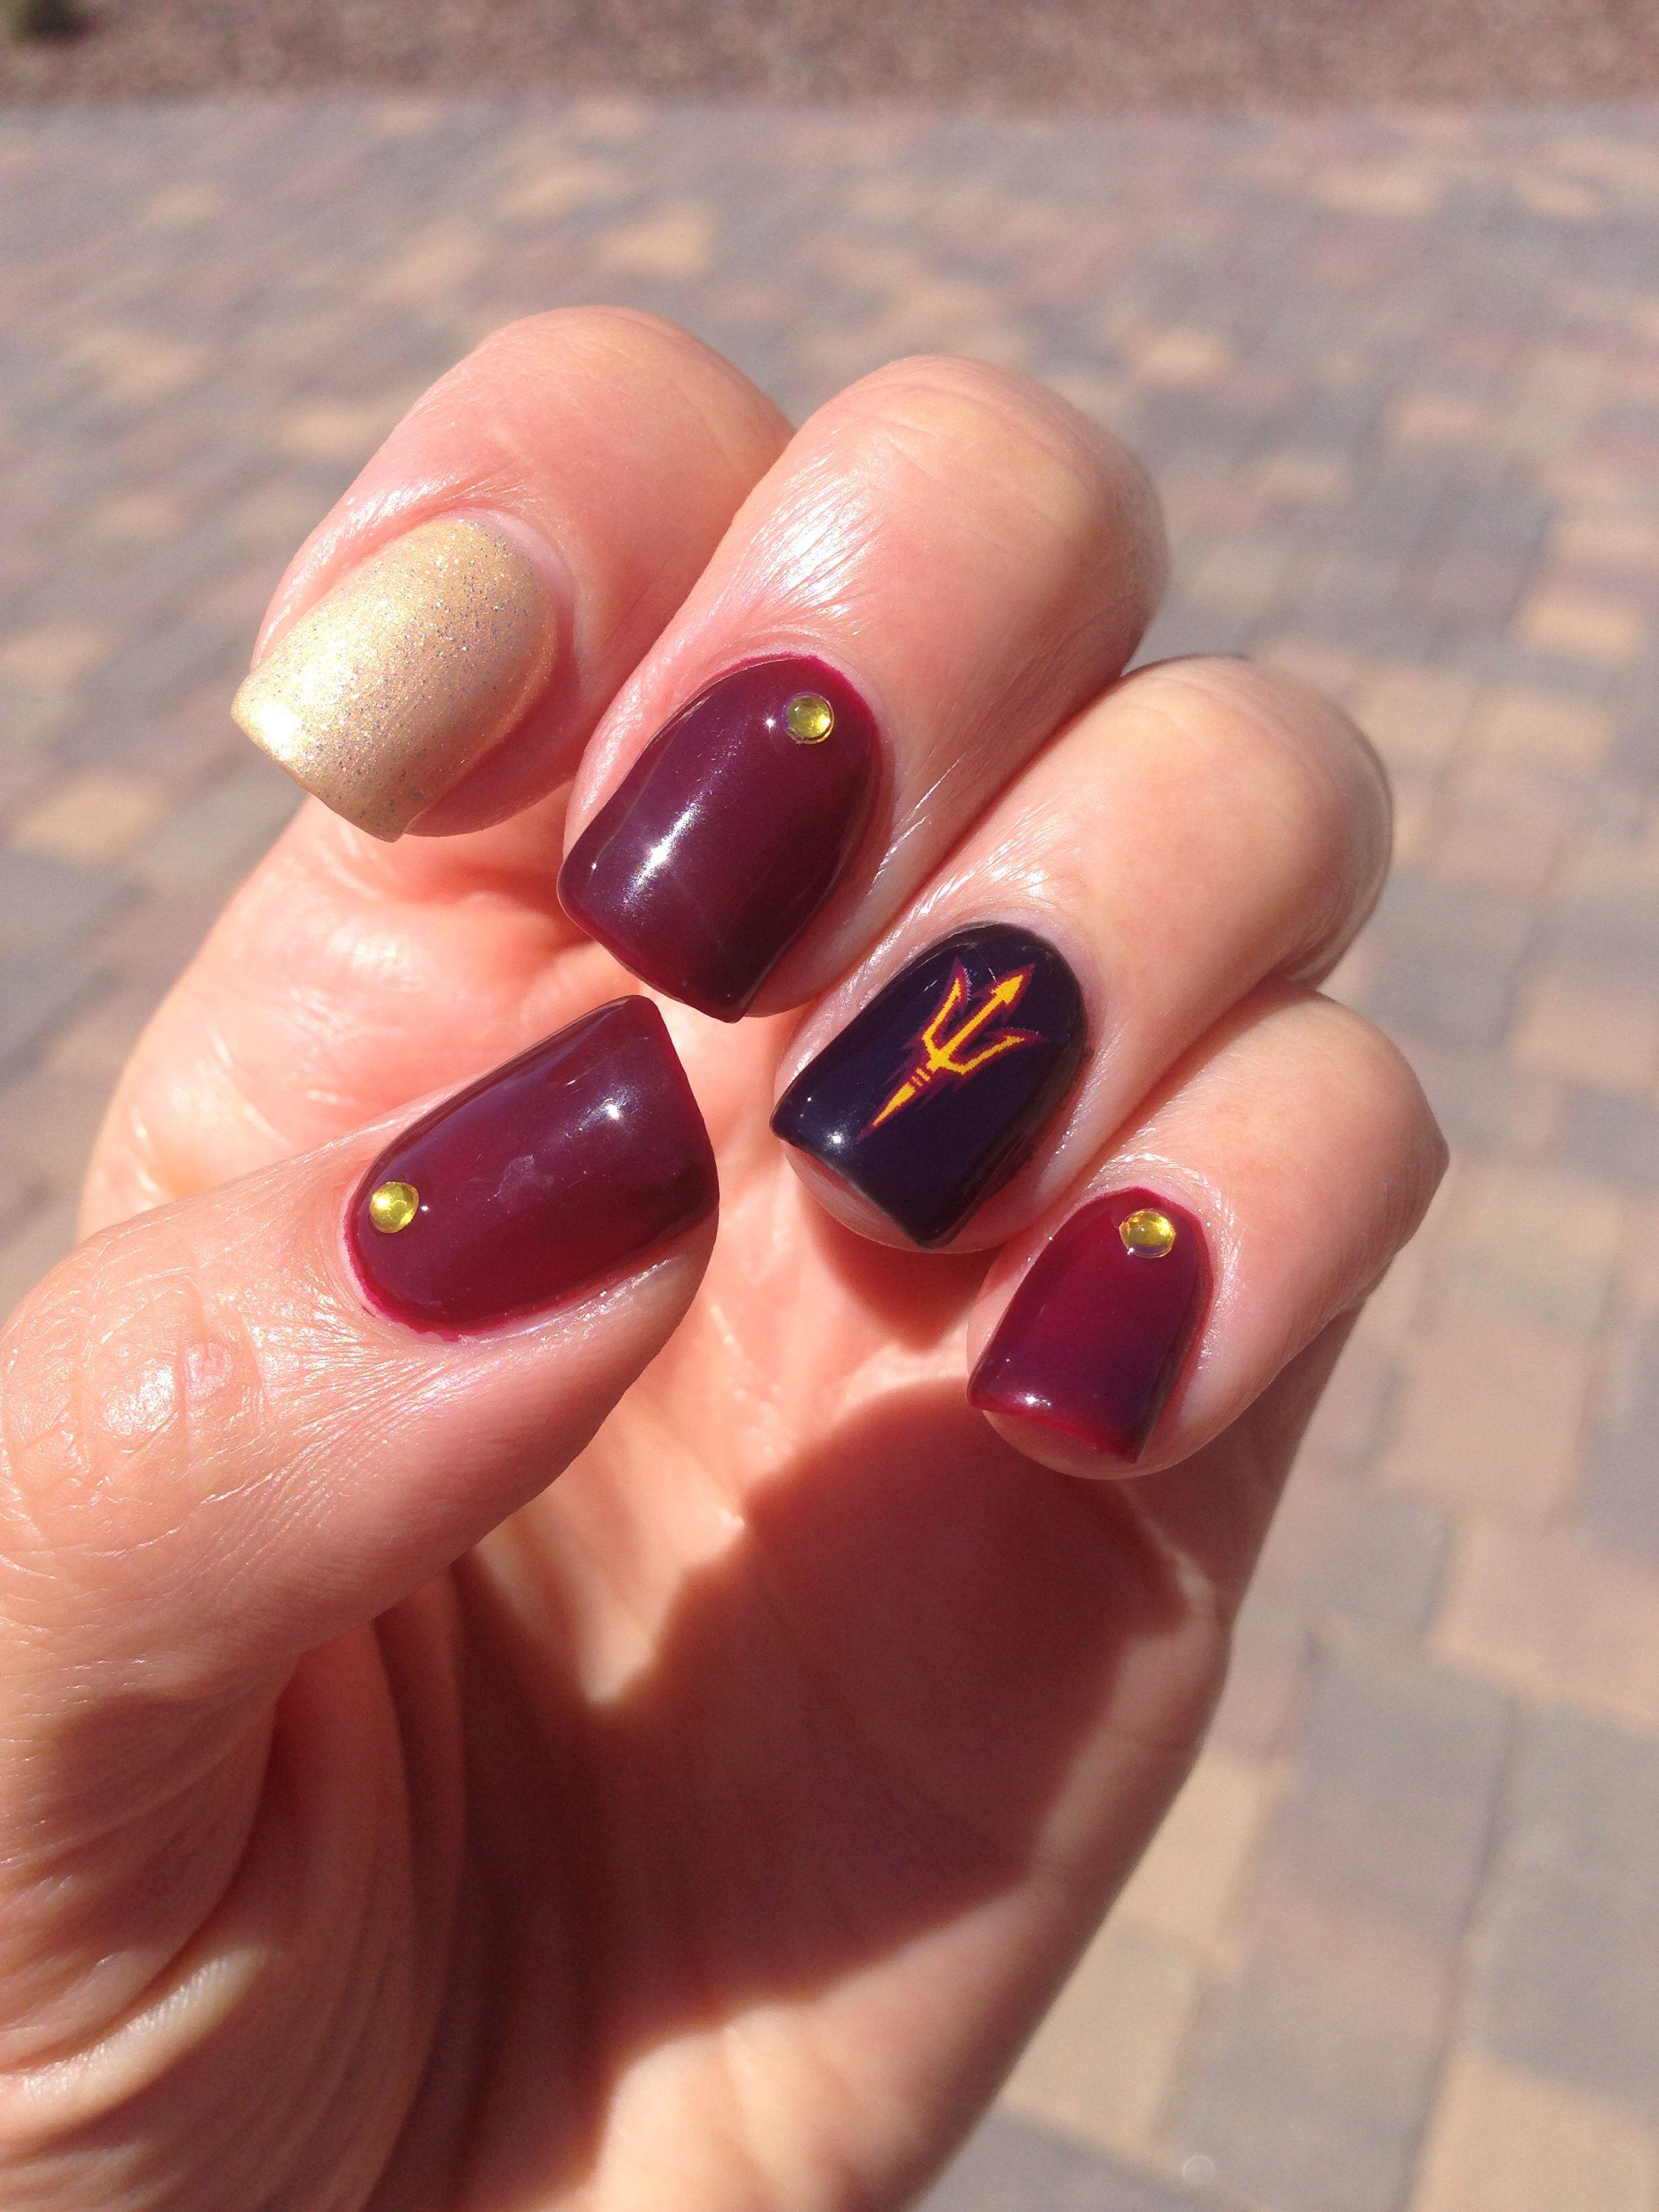 Nails for the ASU game! Gelish polish and mini Arizona State ...